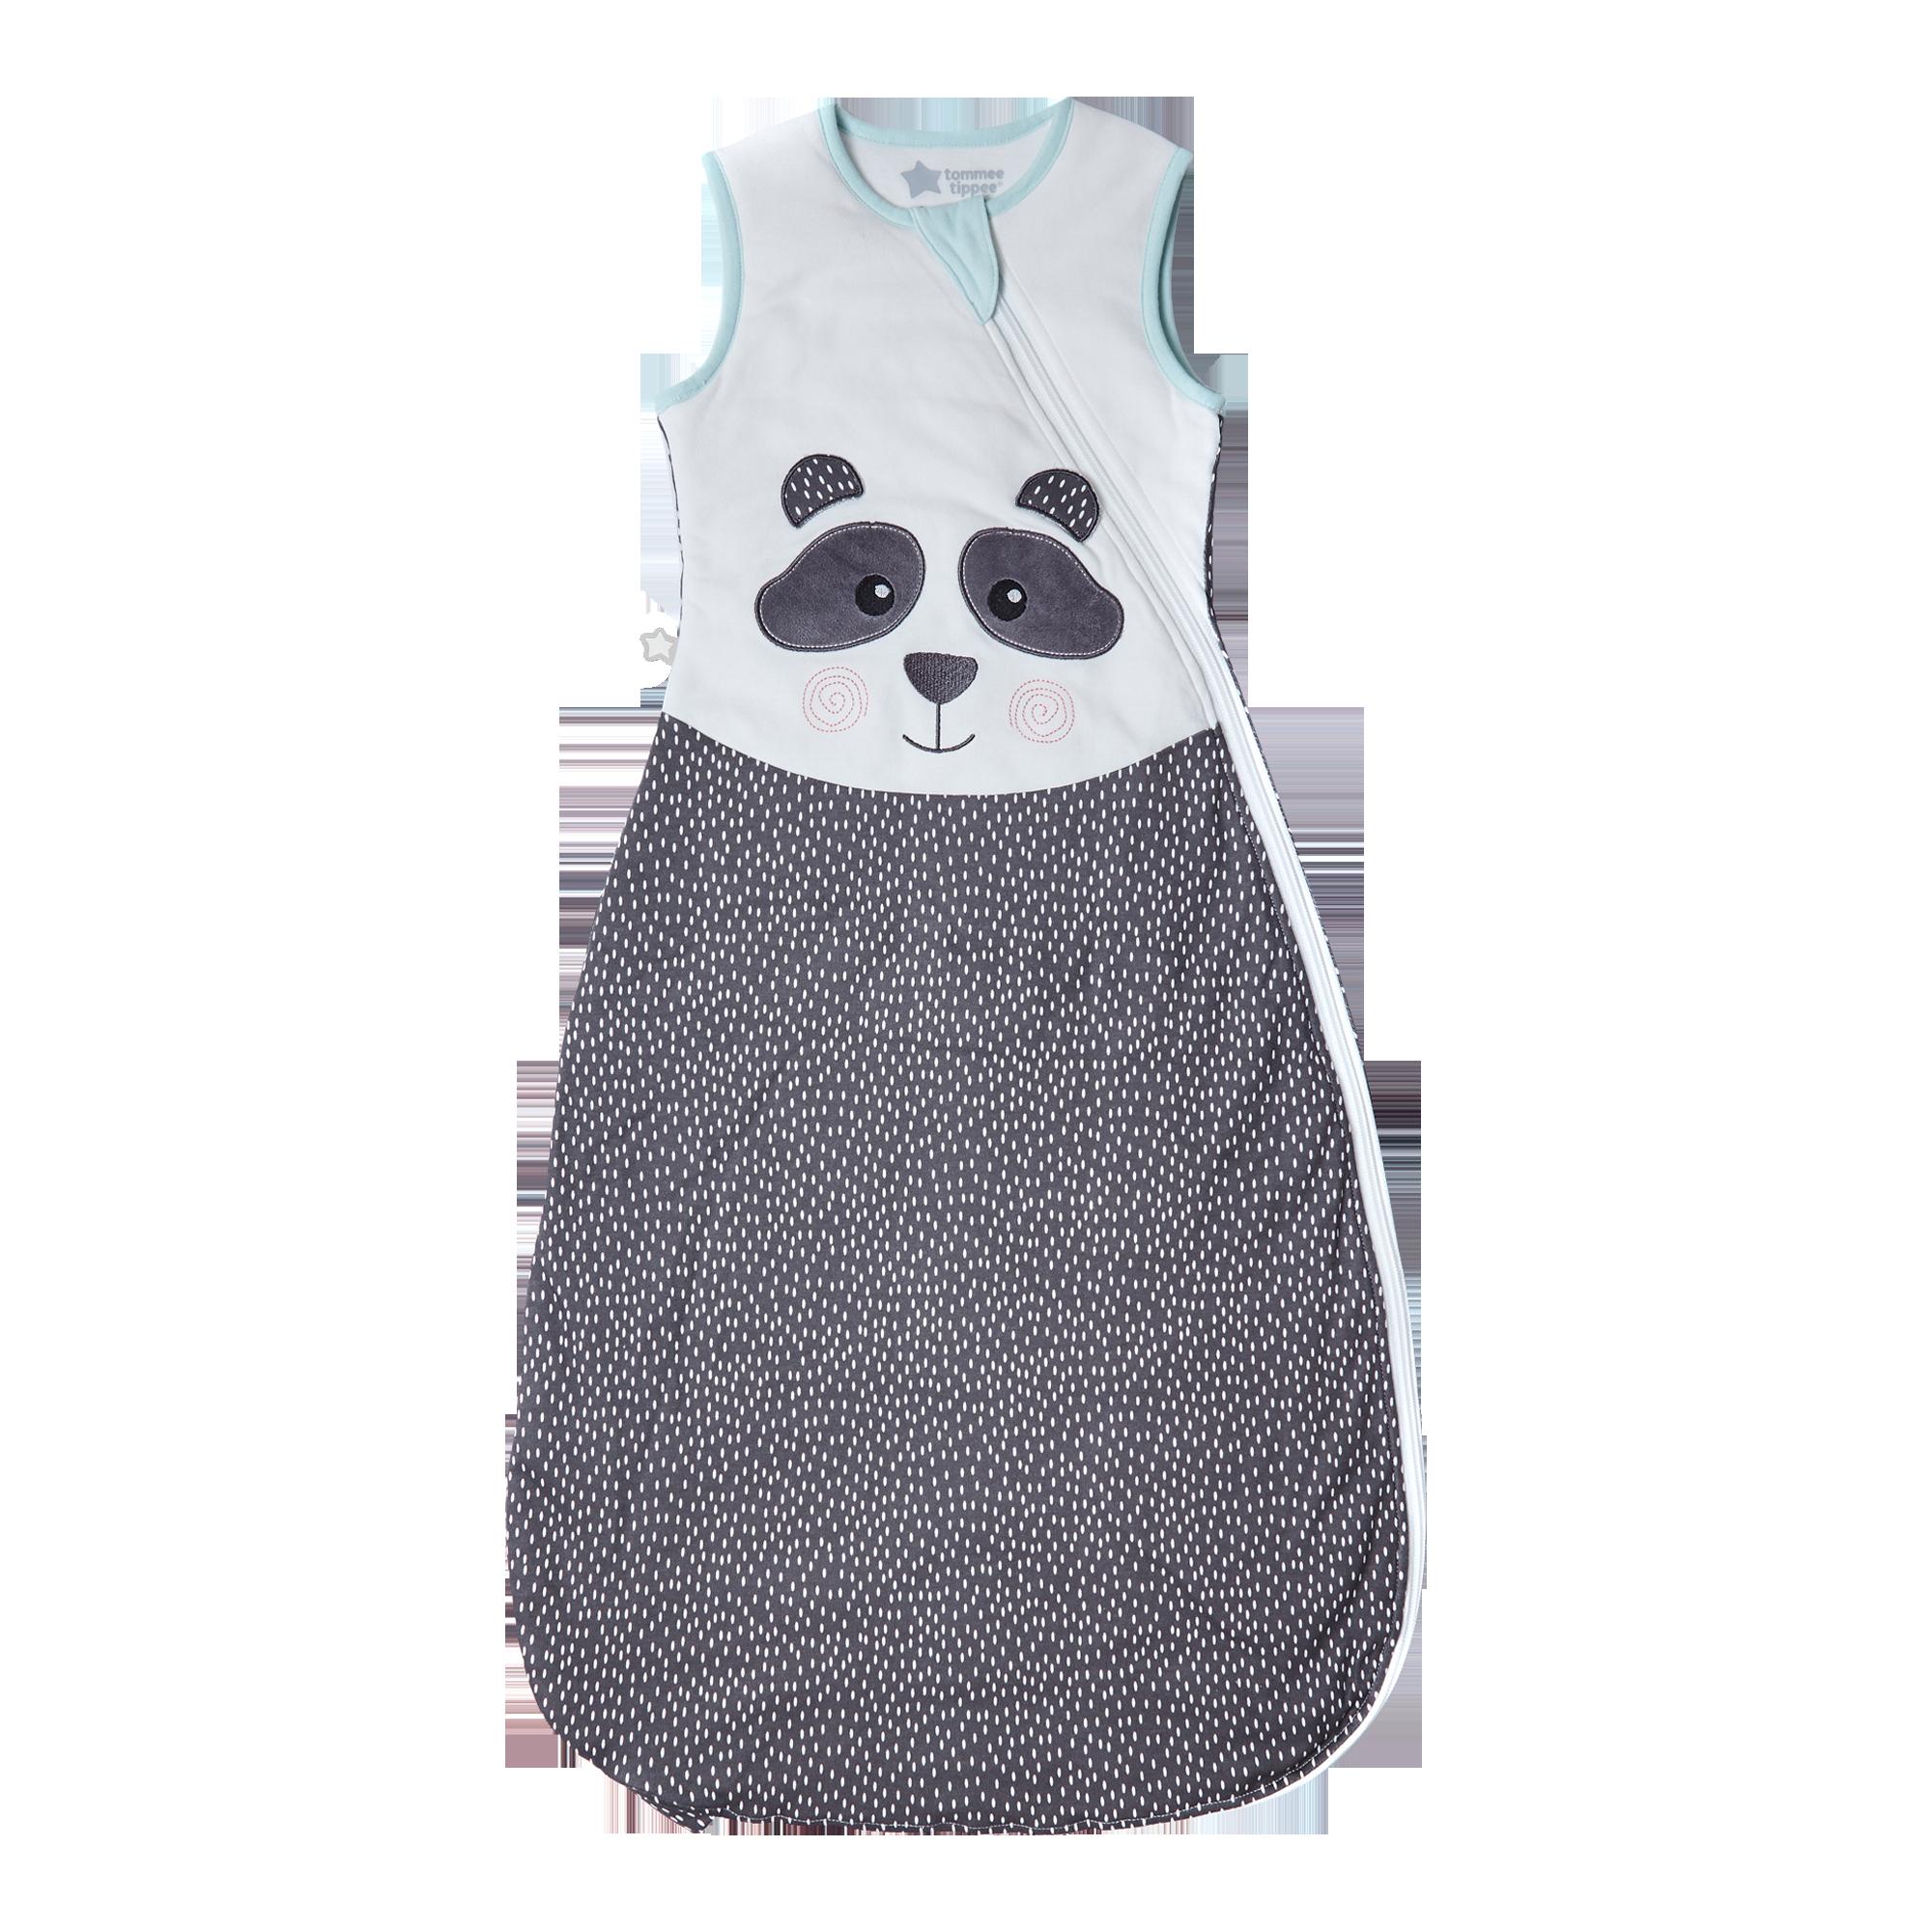 Sac de dormit Tommee Tippee, (18 - 36 luni), 1 tog, Ursulet Panda